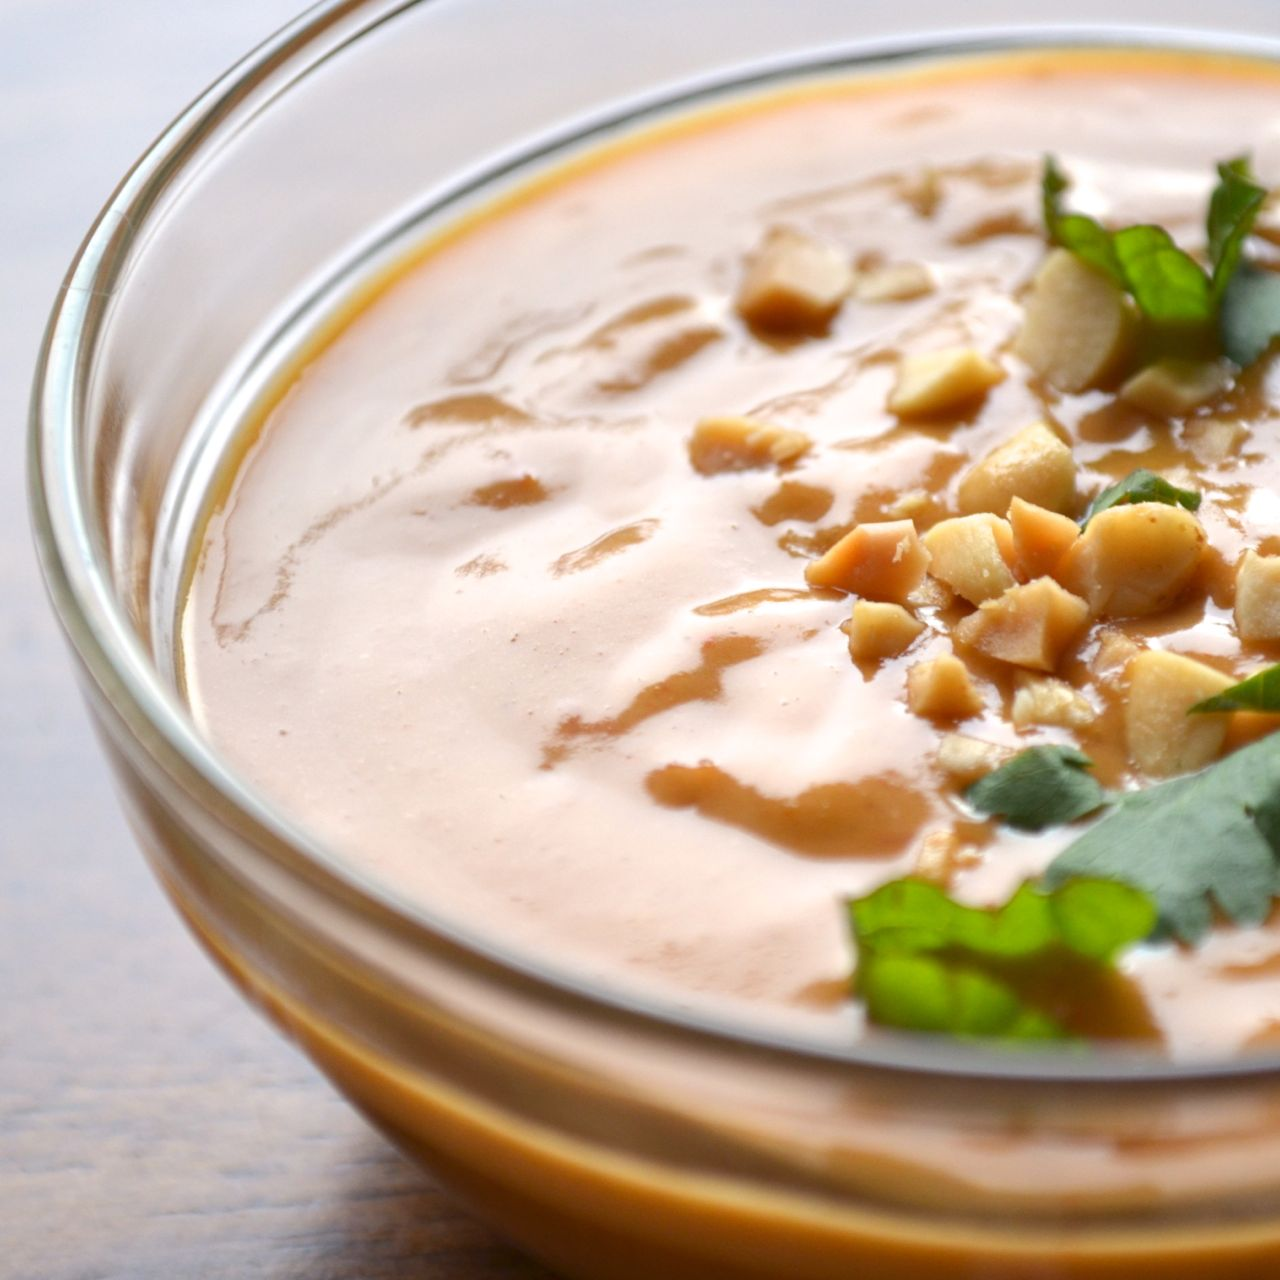 Thai Peanut Sauce Peanut Butter 102